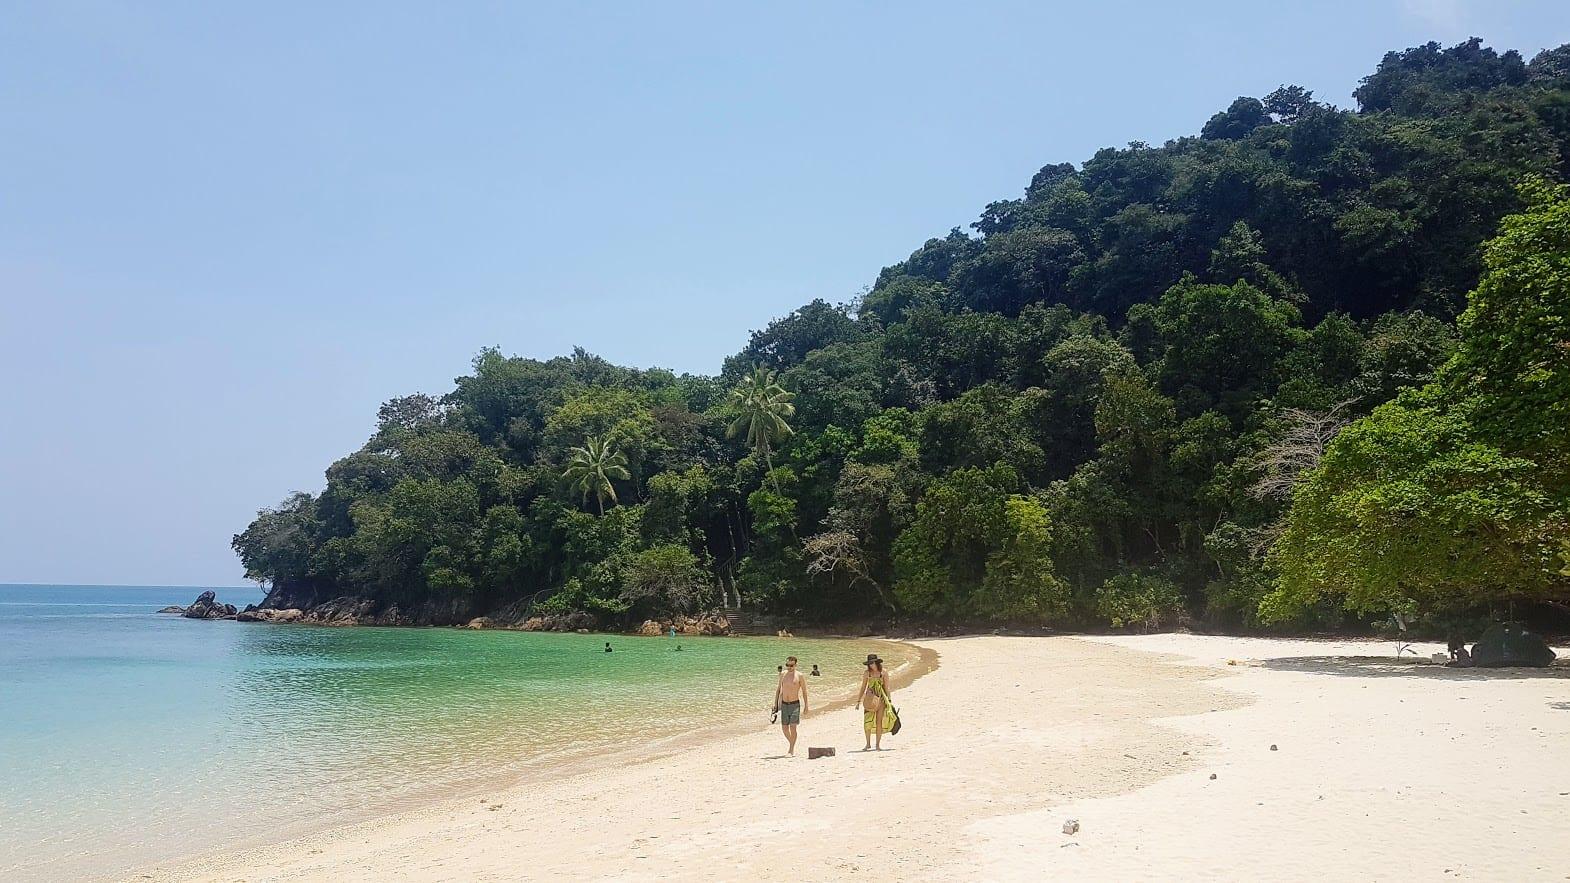 Walking along the beach in Kapas Island Malaysia